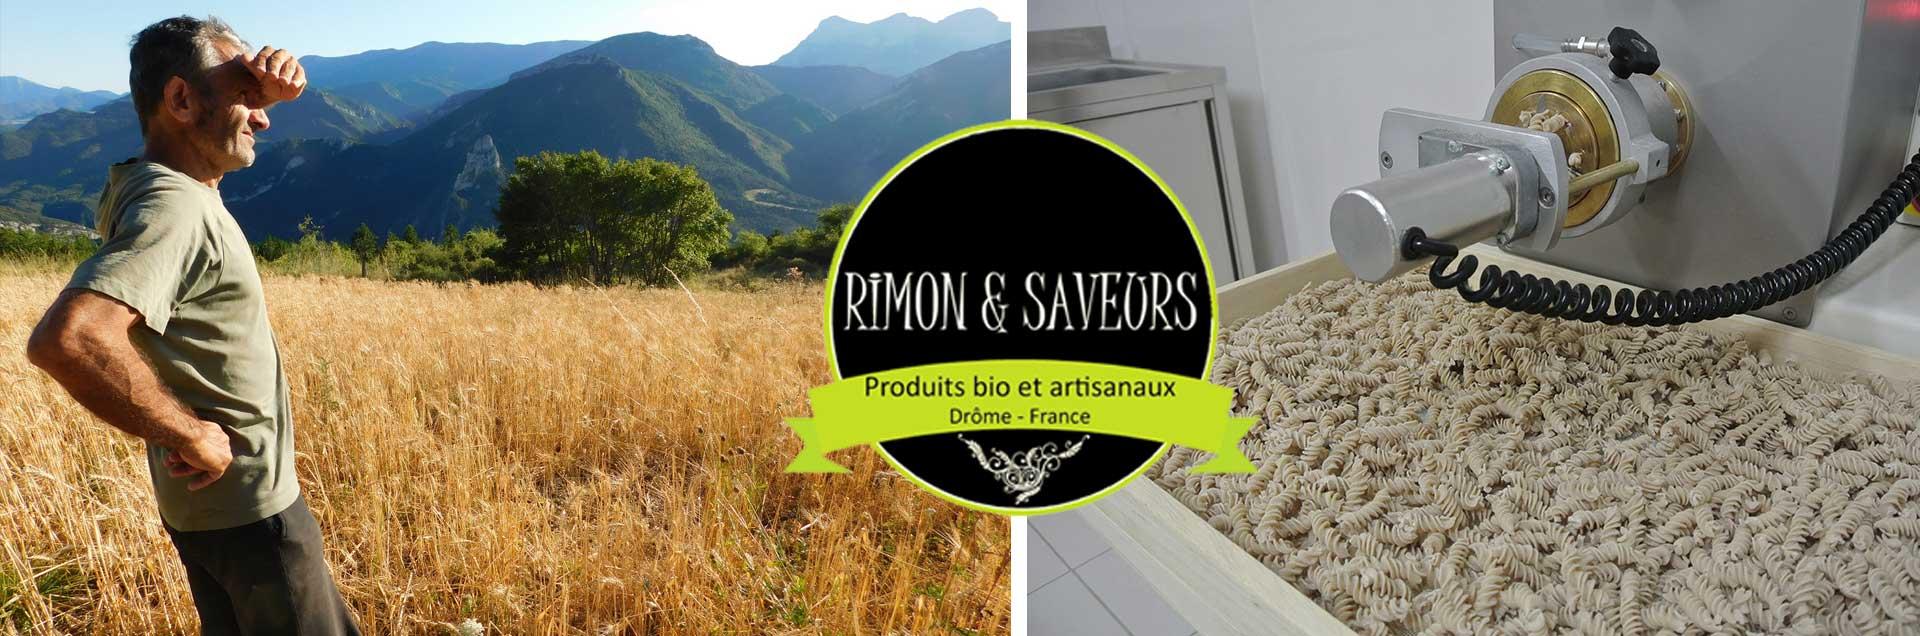 Riùmon & Saveurs - pates bio et artisanales